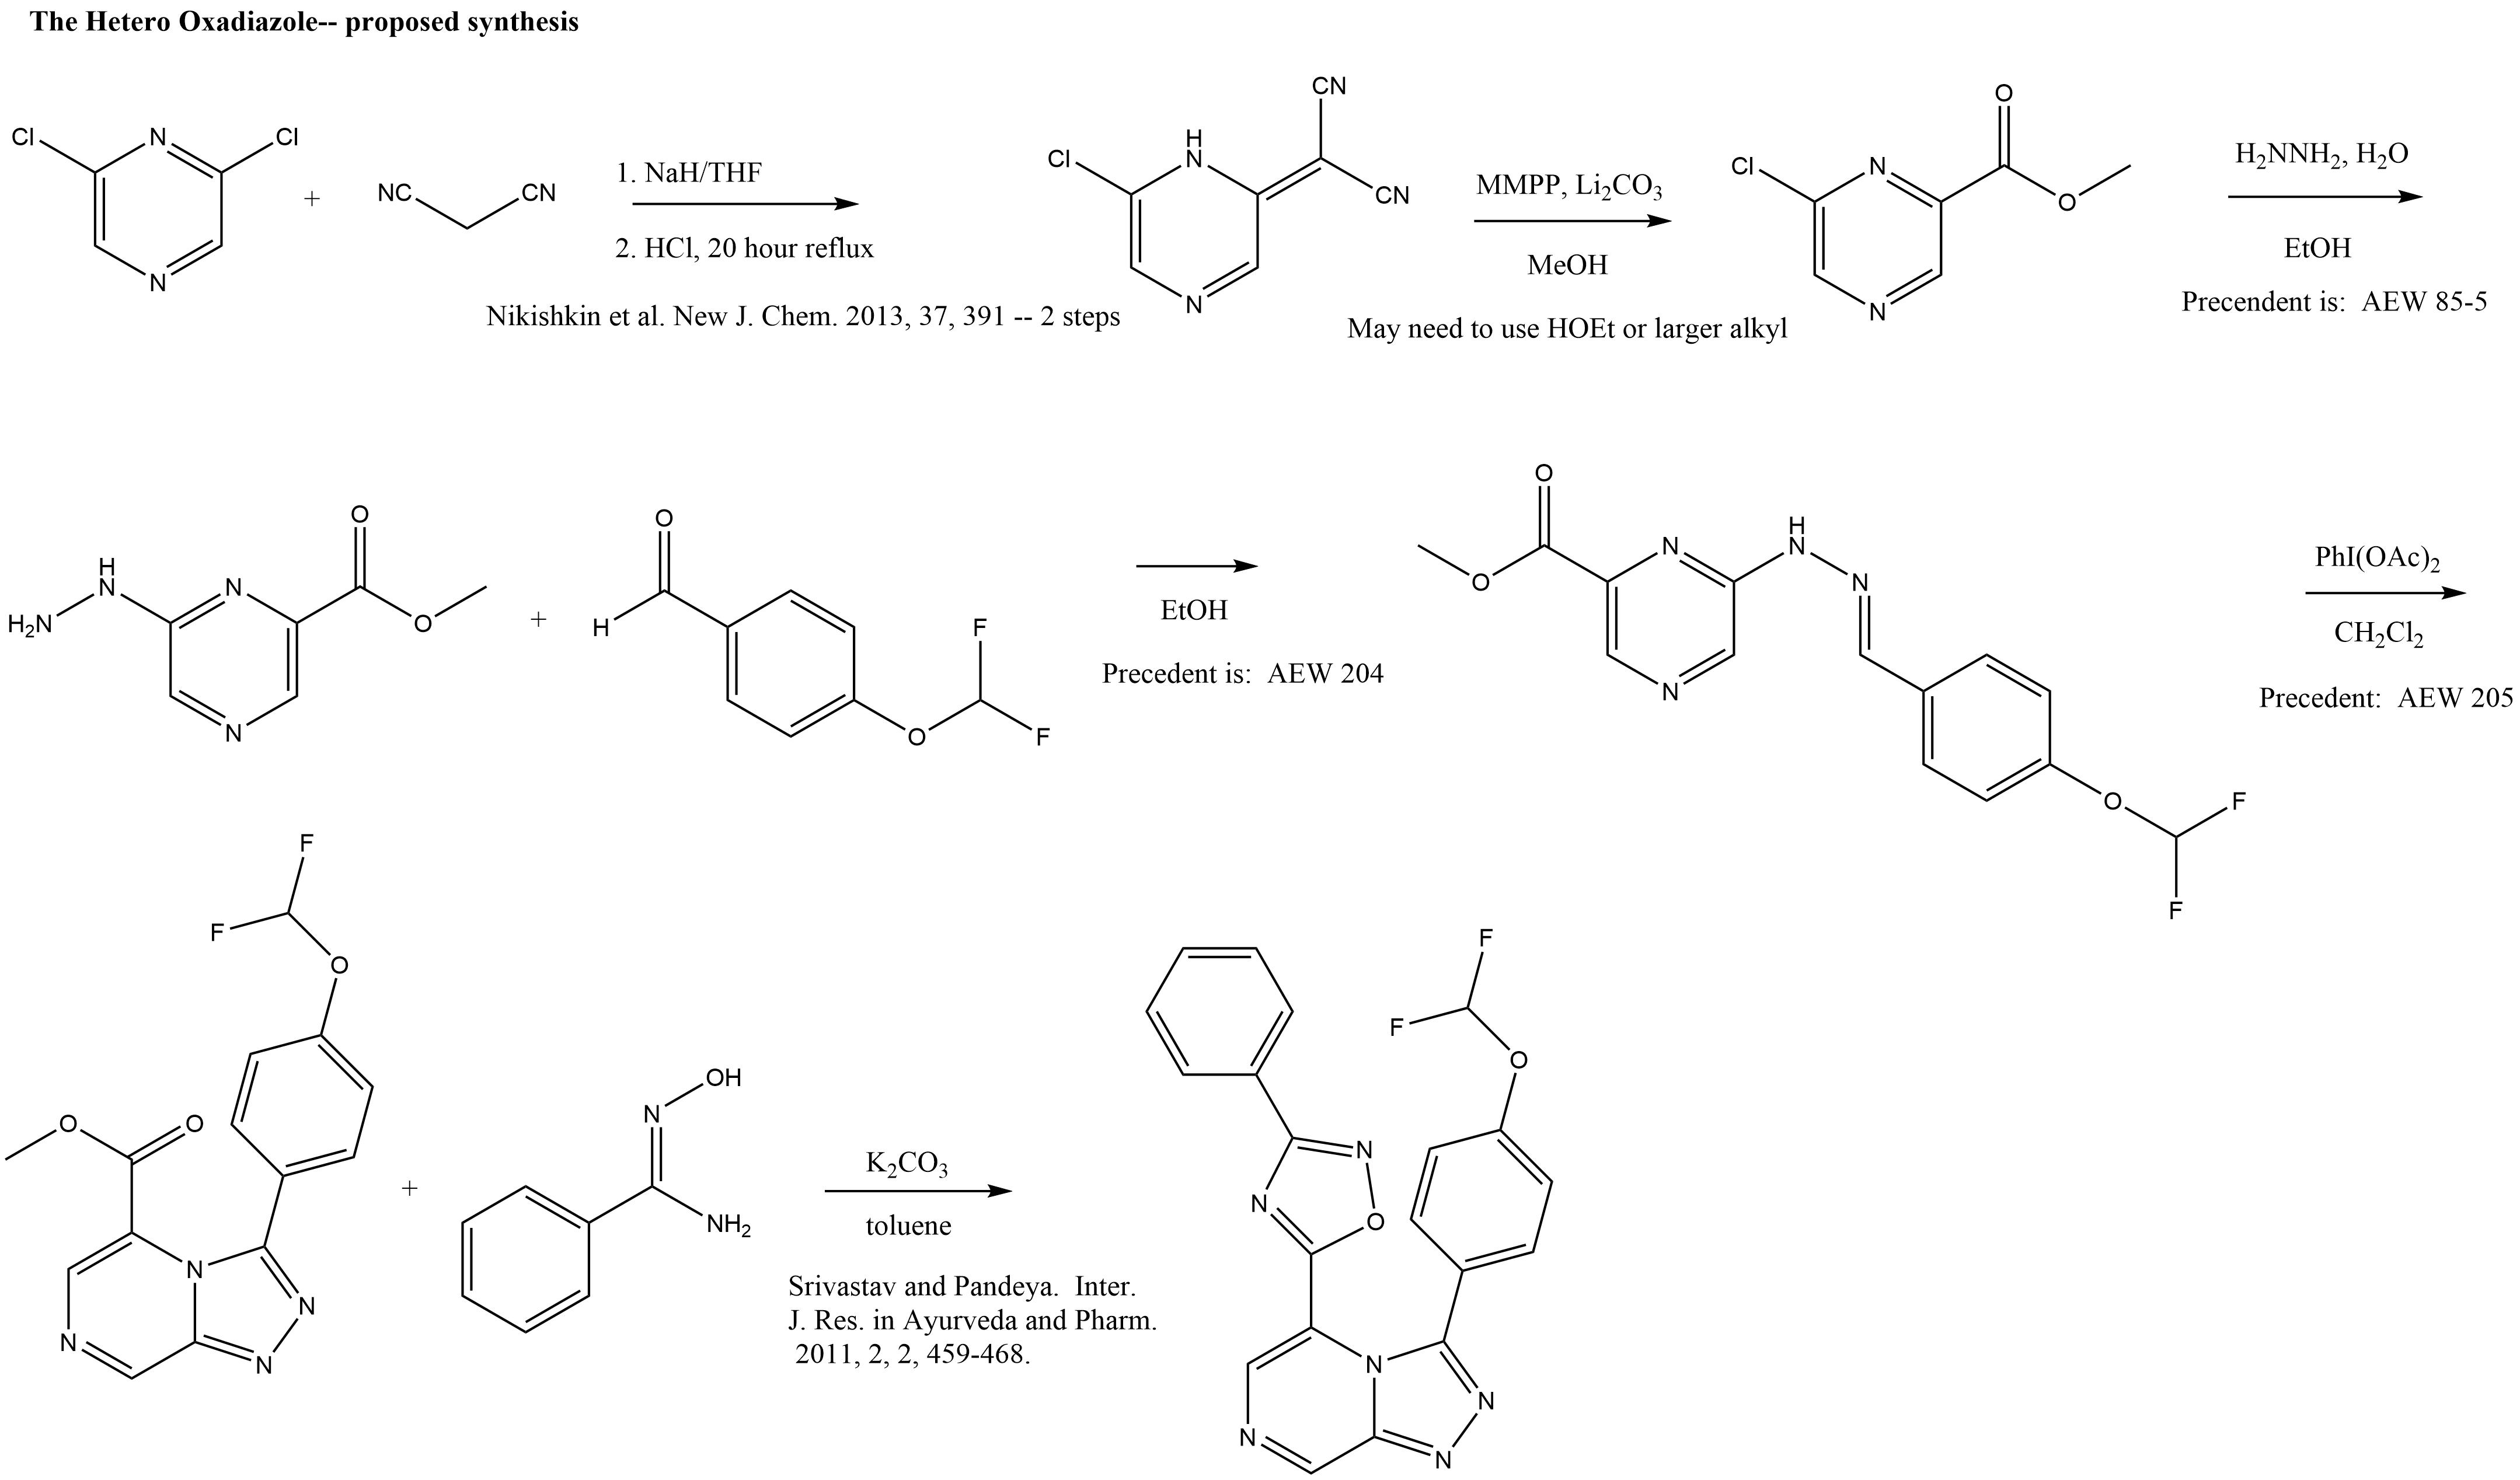 the hetero oxadiazole